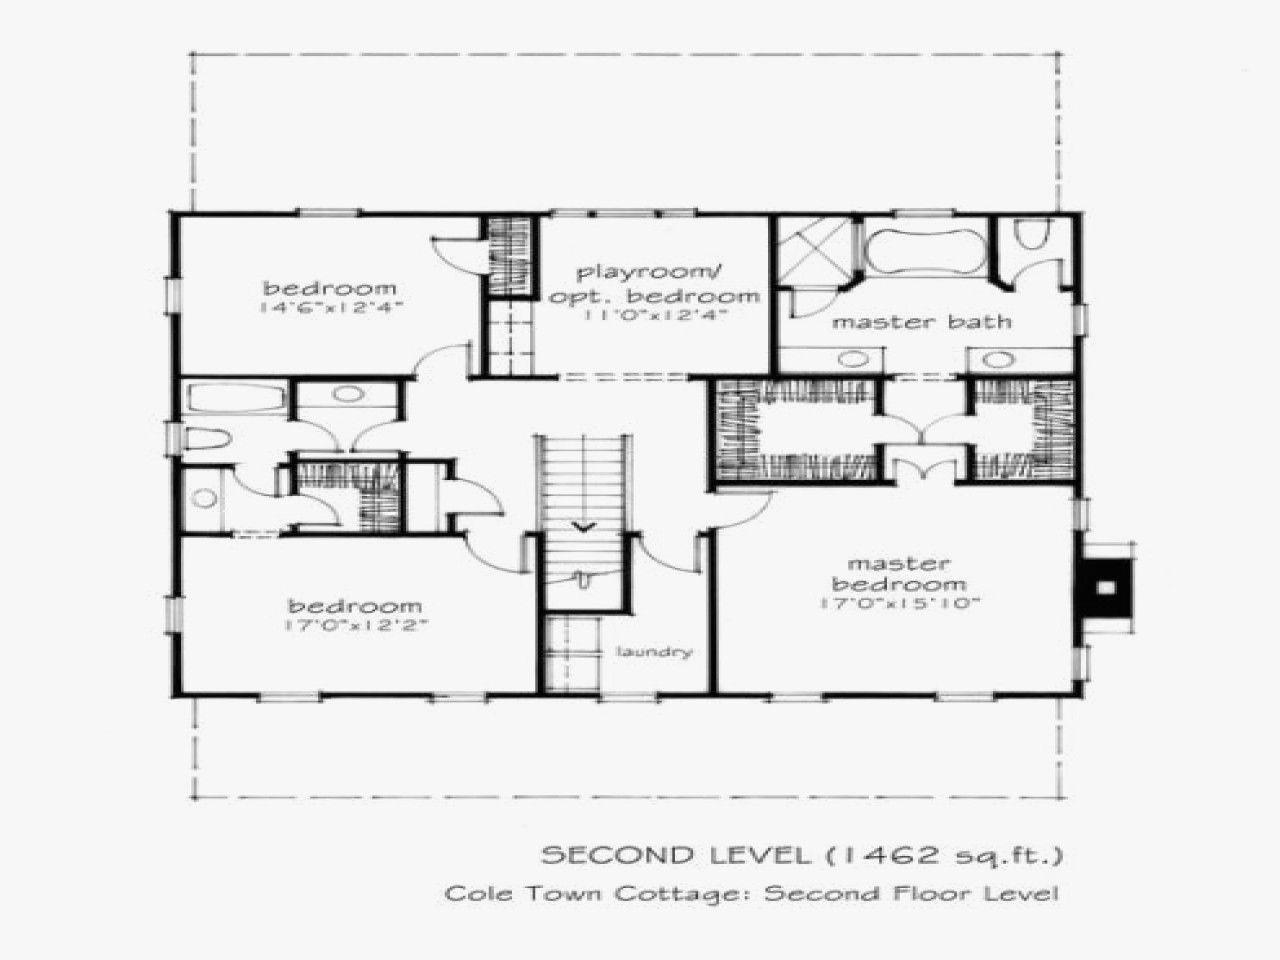 200 Sq Ft House Plans Impressive Inspiration Interior Design 600 Duplex Inspirational Sf Plan House Plans Small Modern House Plans Southern Living House Plans